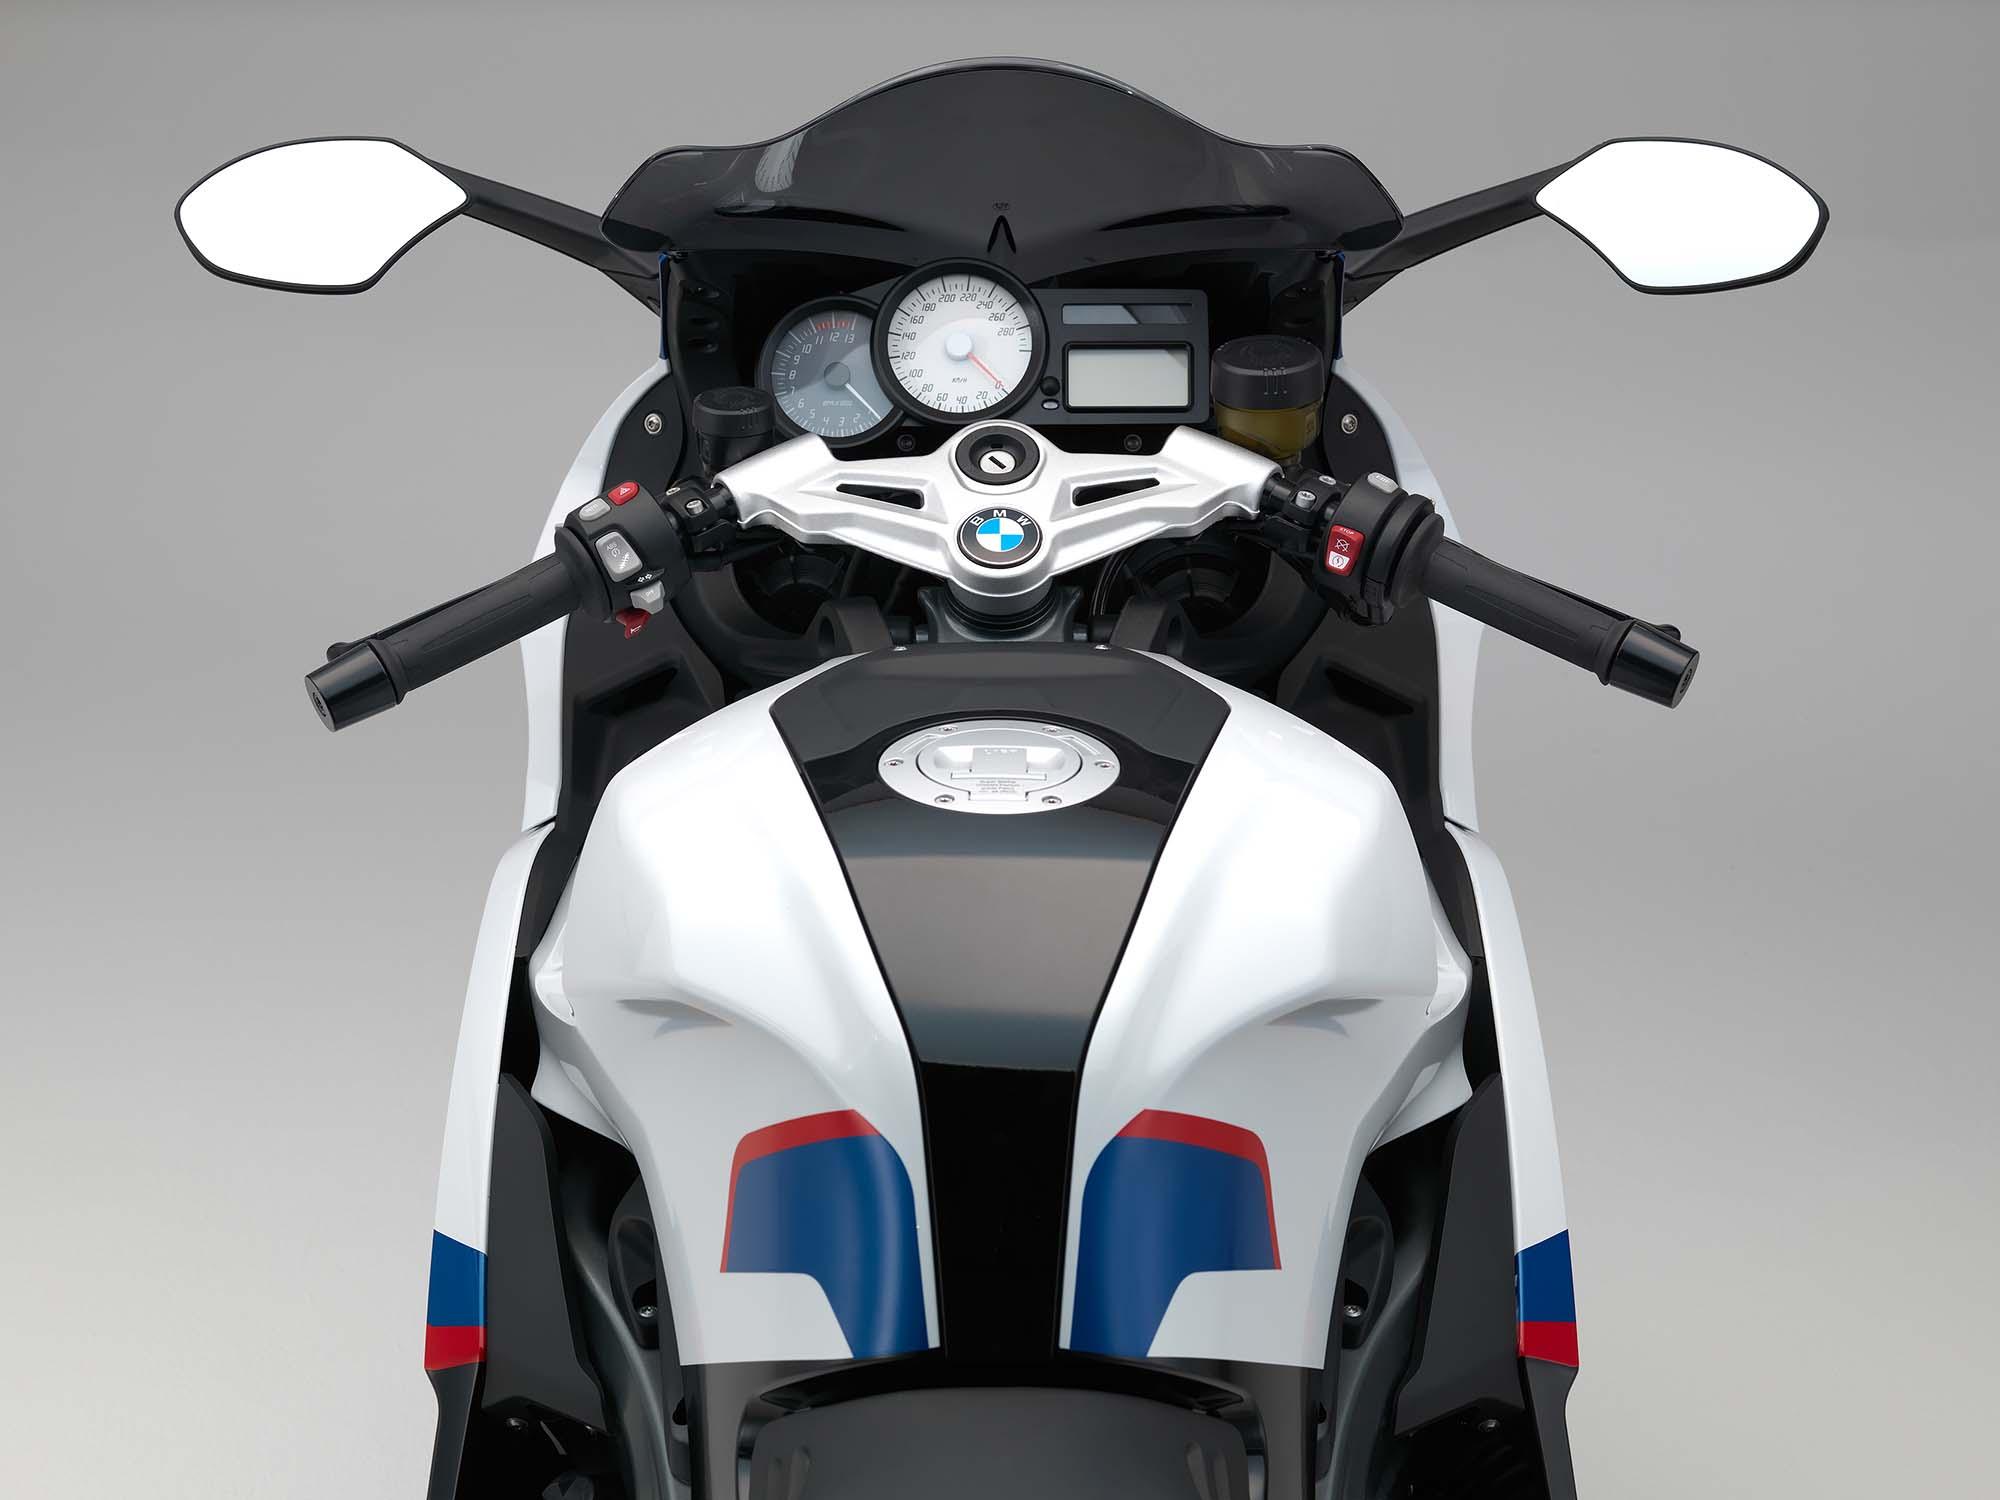 http://i2.wp.com/www.asphaltandrubber.com/wp-content/uploads/2014/07/2015-BMW-K1300S-06.jpg